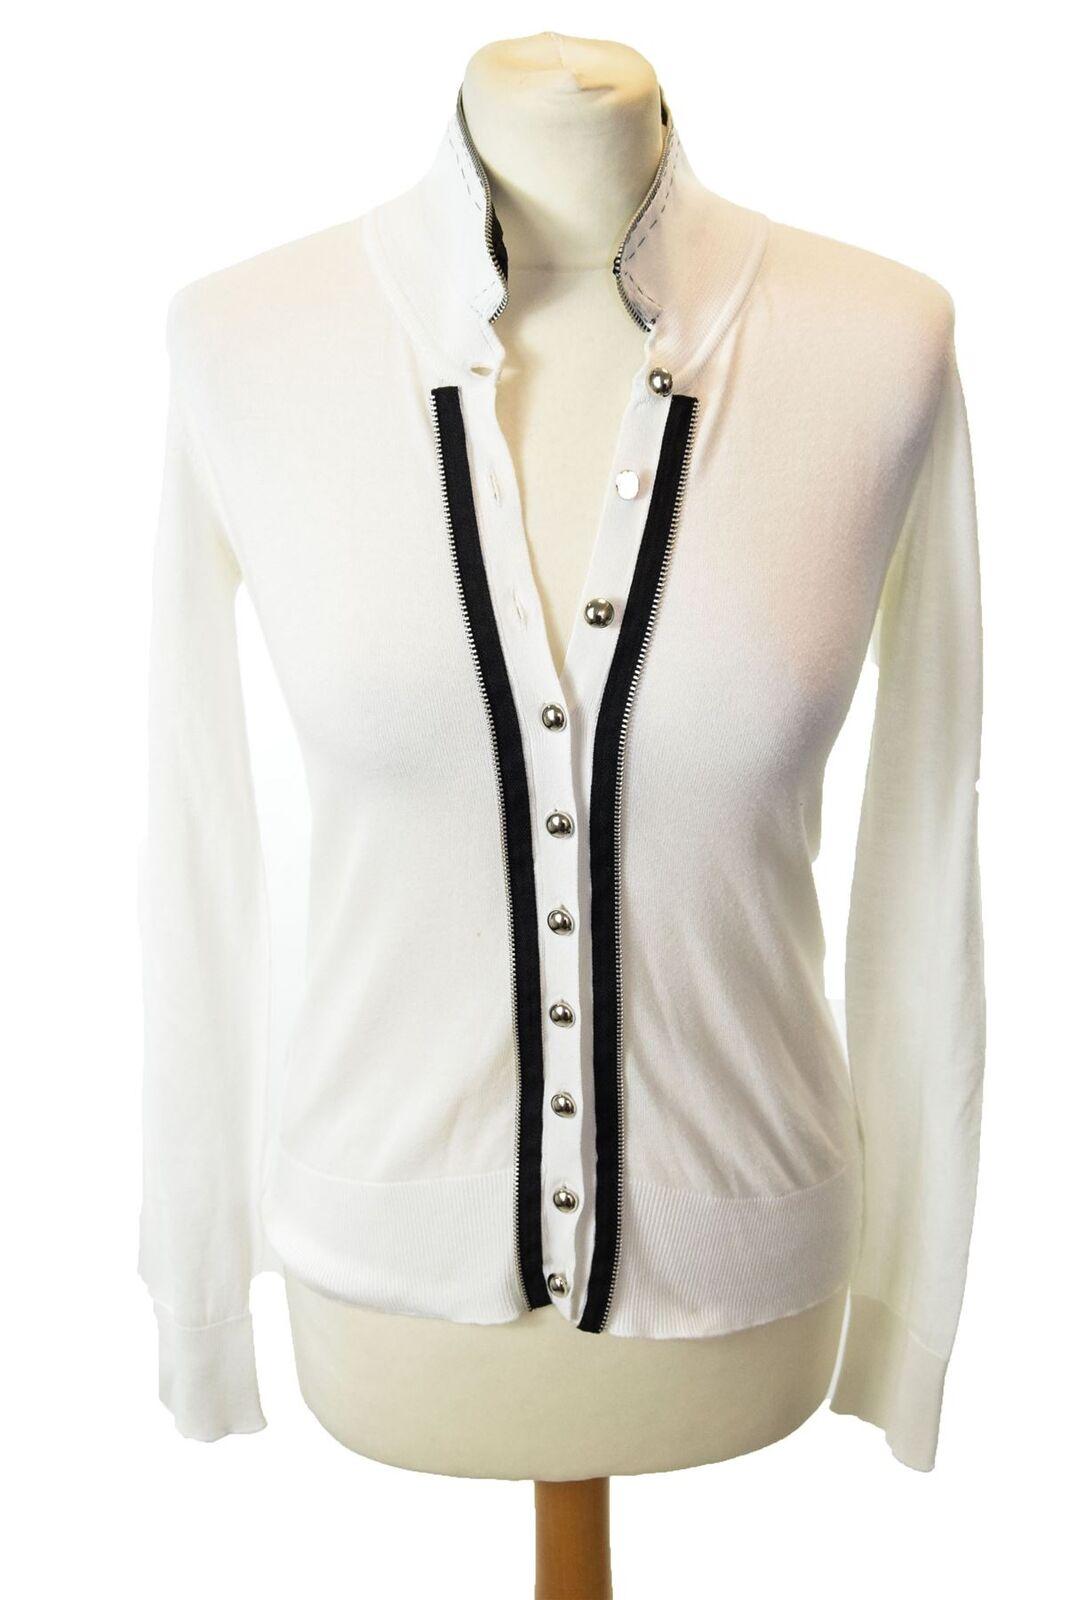 CLEMENTS RIBEIRO White 100% Cotton Cardigan, Size S